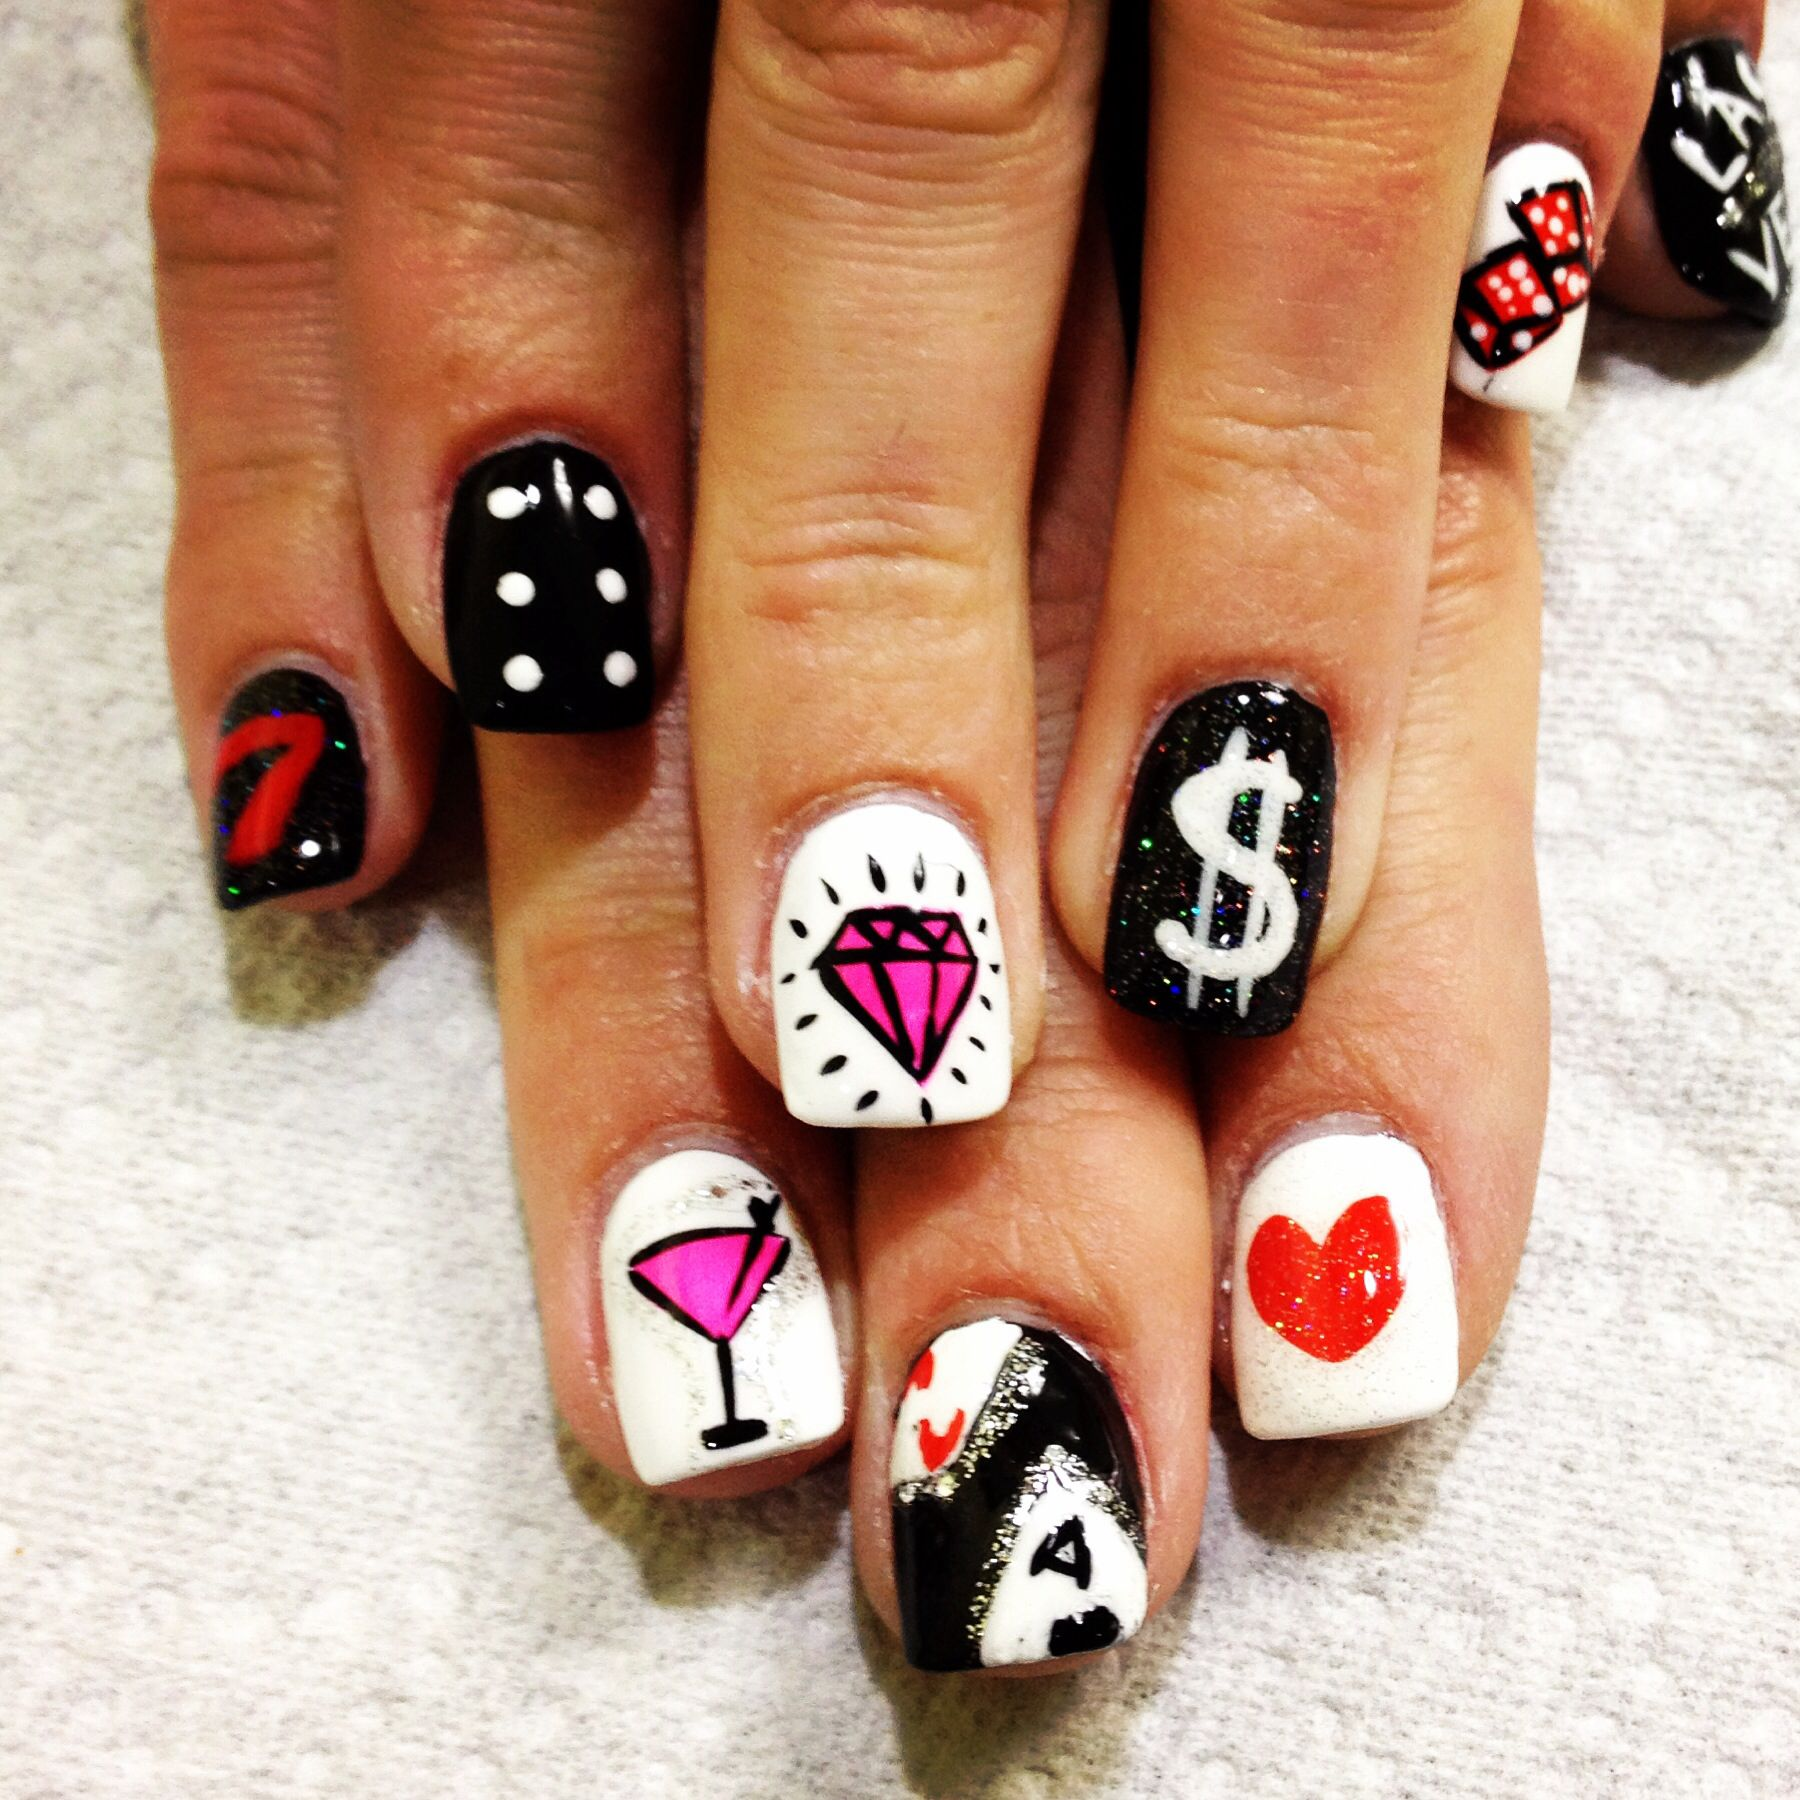 cute vegas nails | Fashion (hair & nails) | Pinterest | Vegas nails